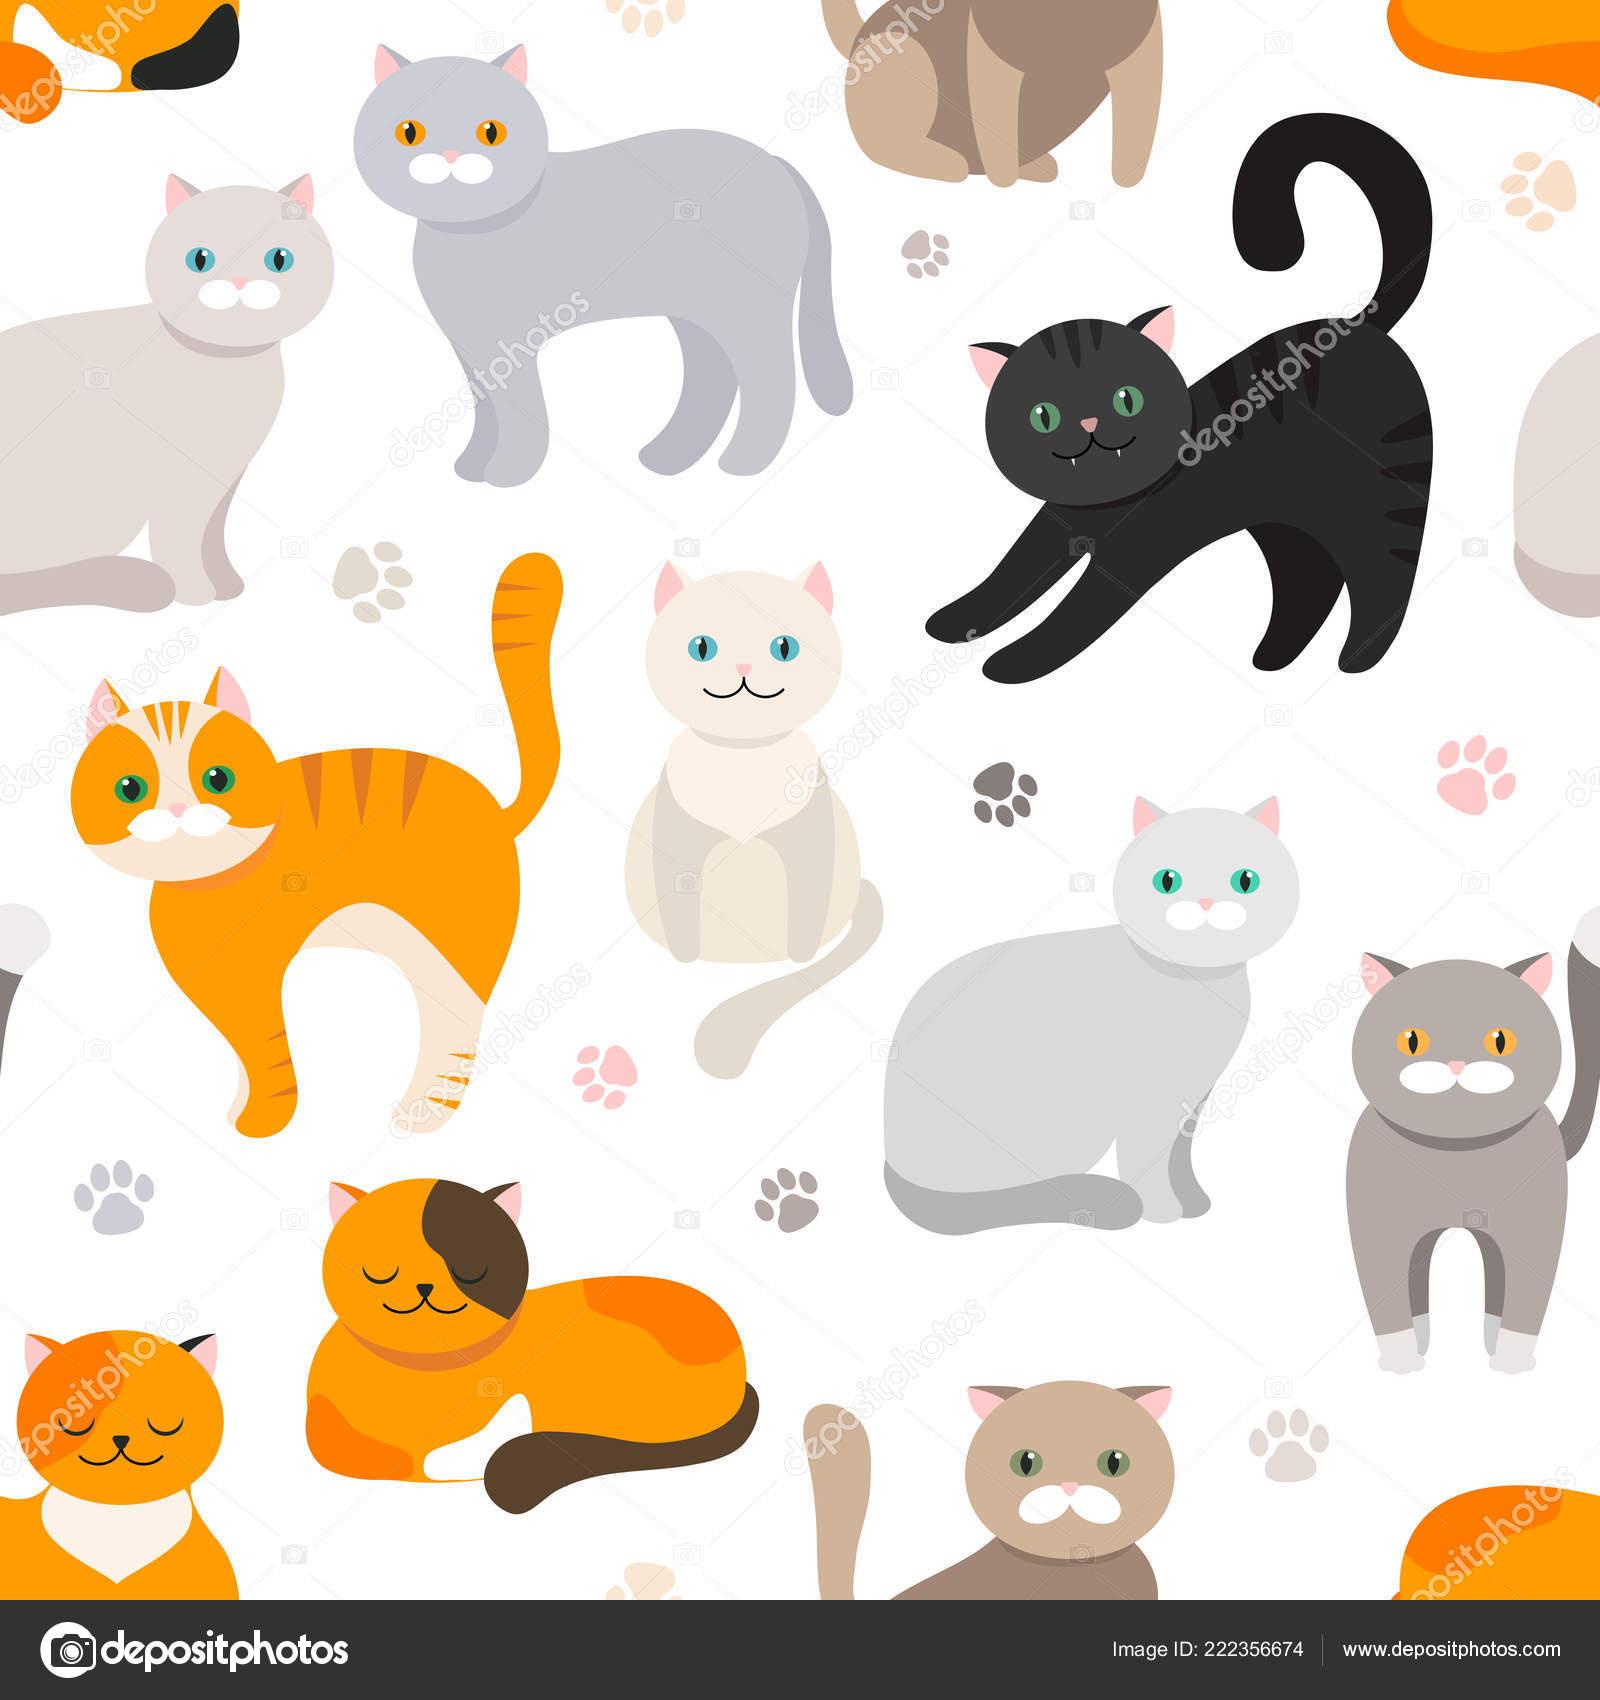 Fondo Gato Patrones Sin Fisuras Dibujo Plano Vector Gatito Animales ...